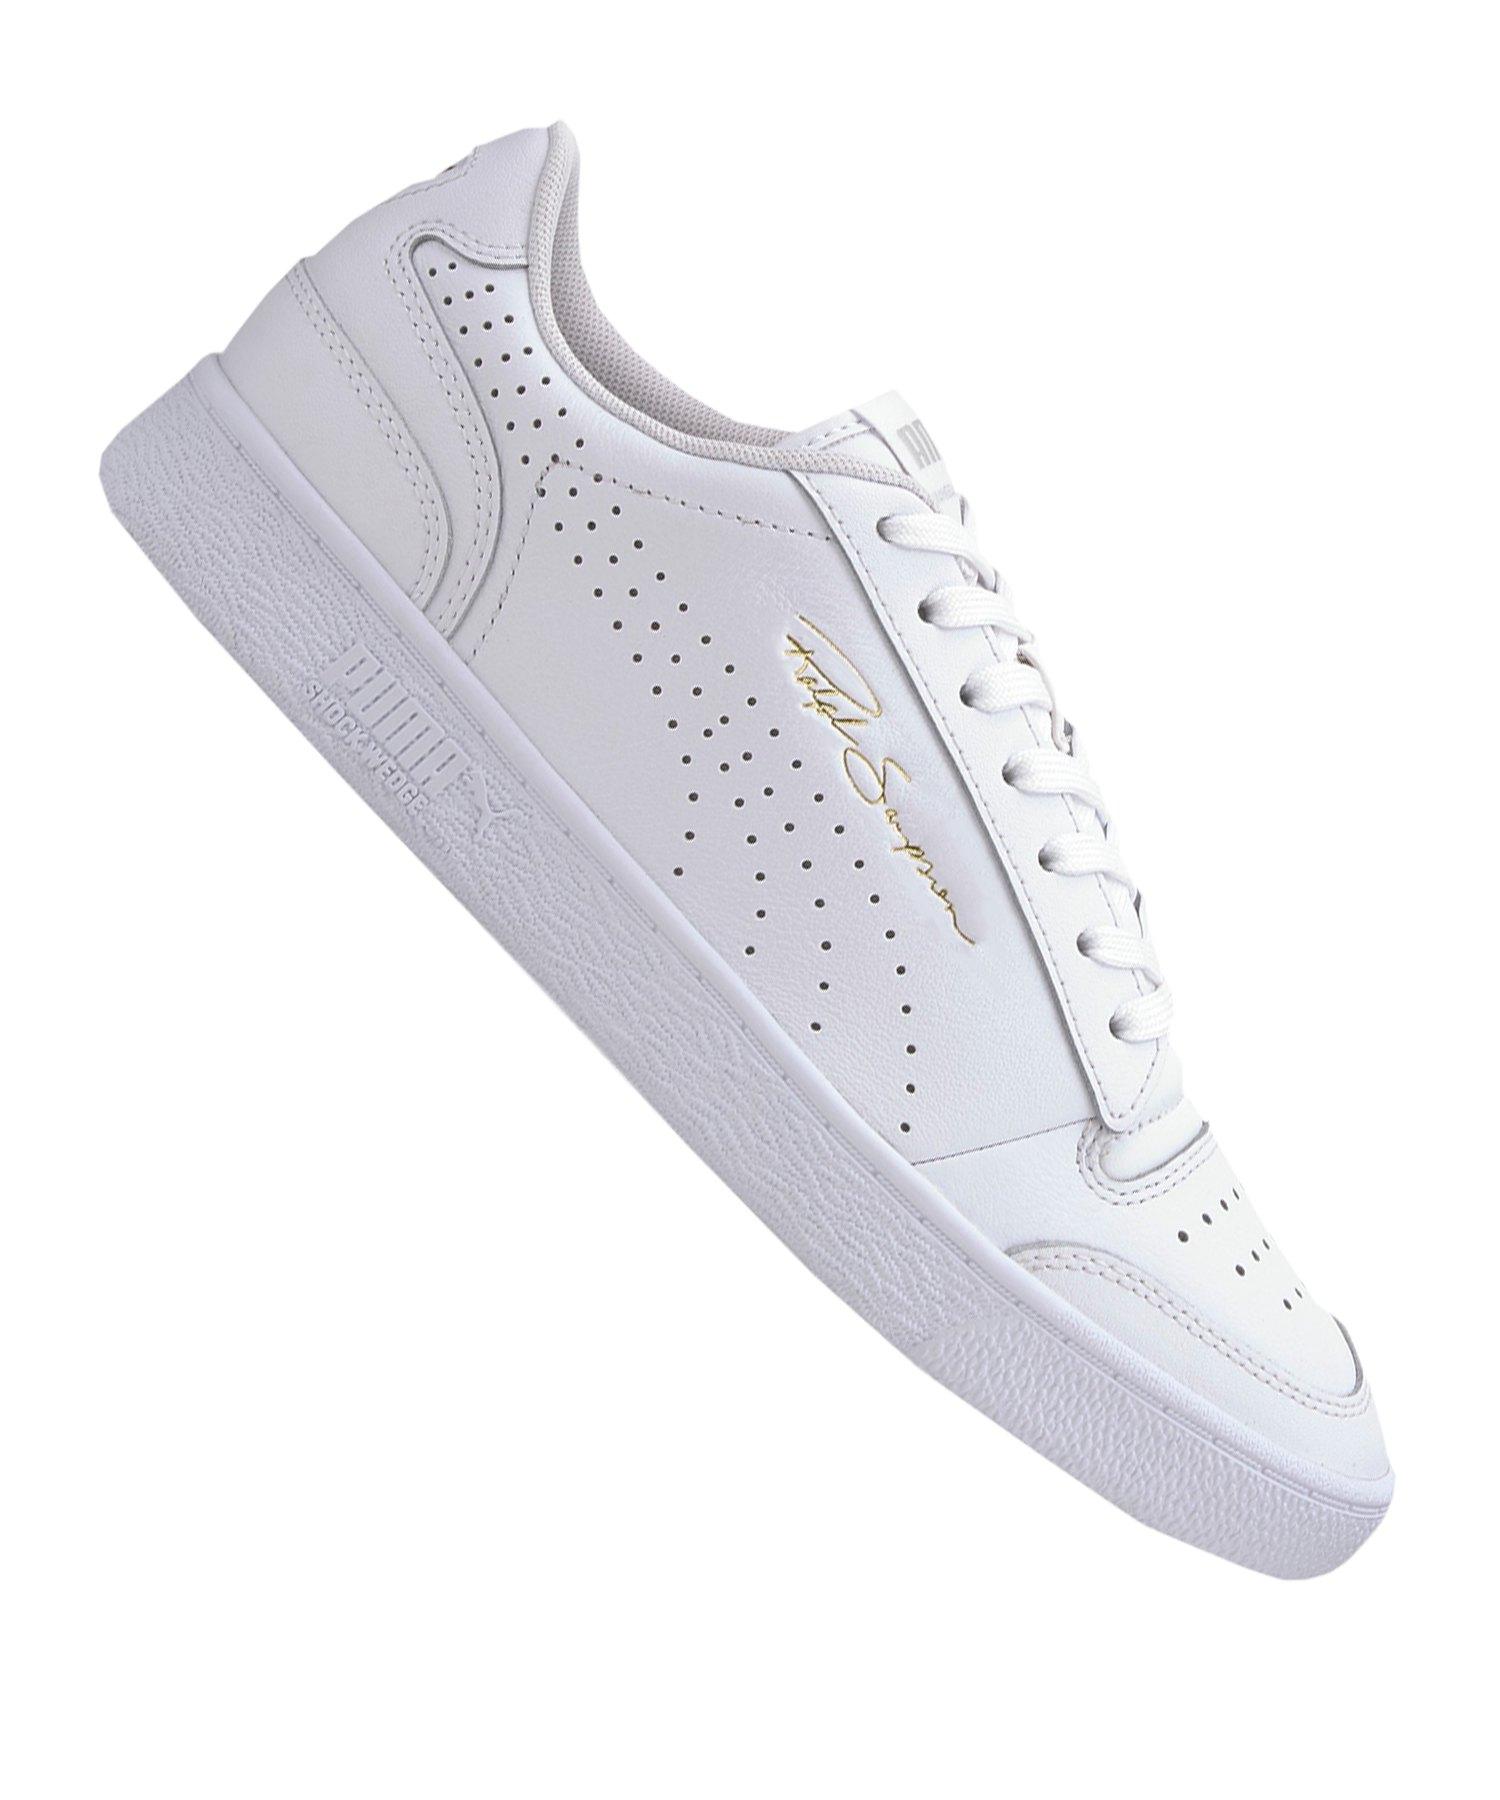 PUMA Ralph Sampson Lo Perf Sneaker Weiss F01 - weiss